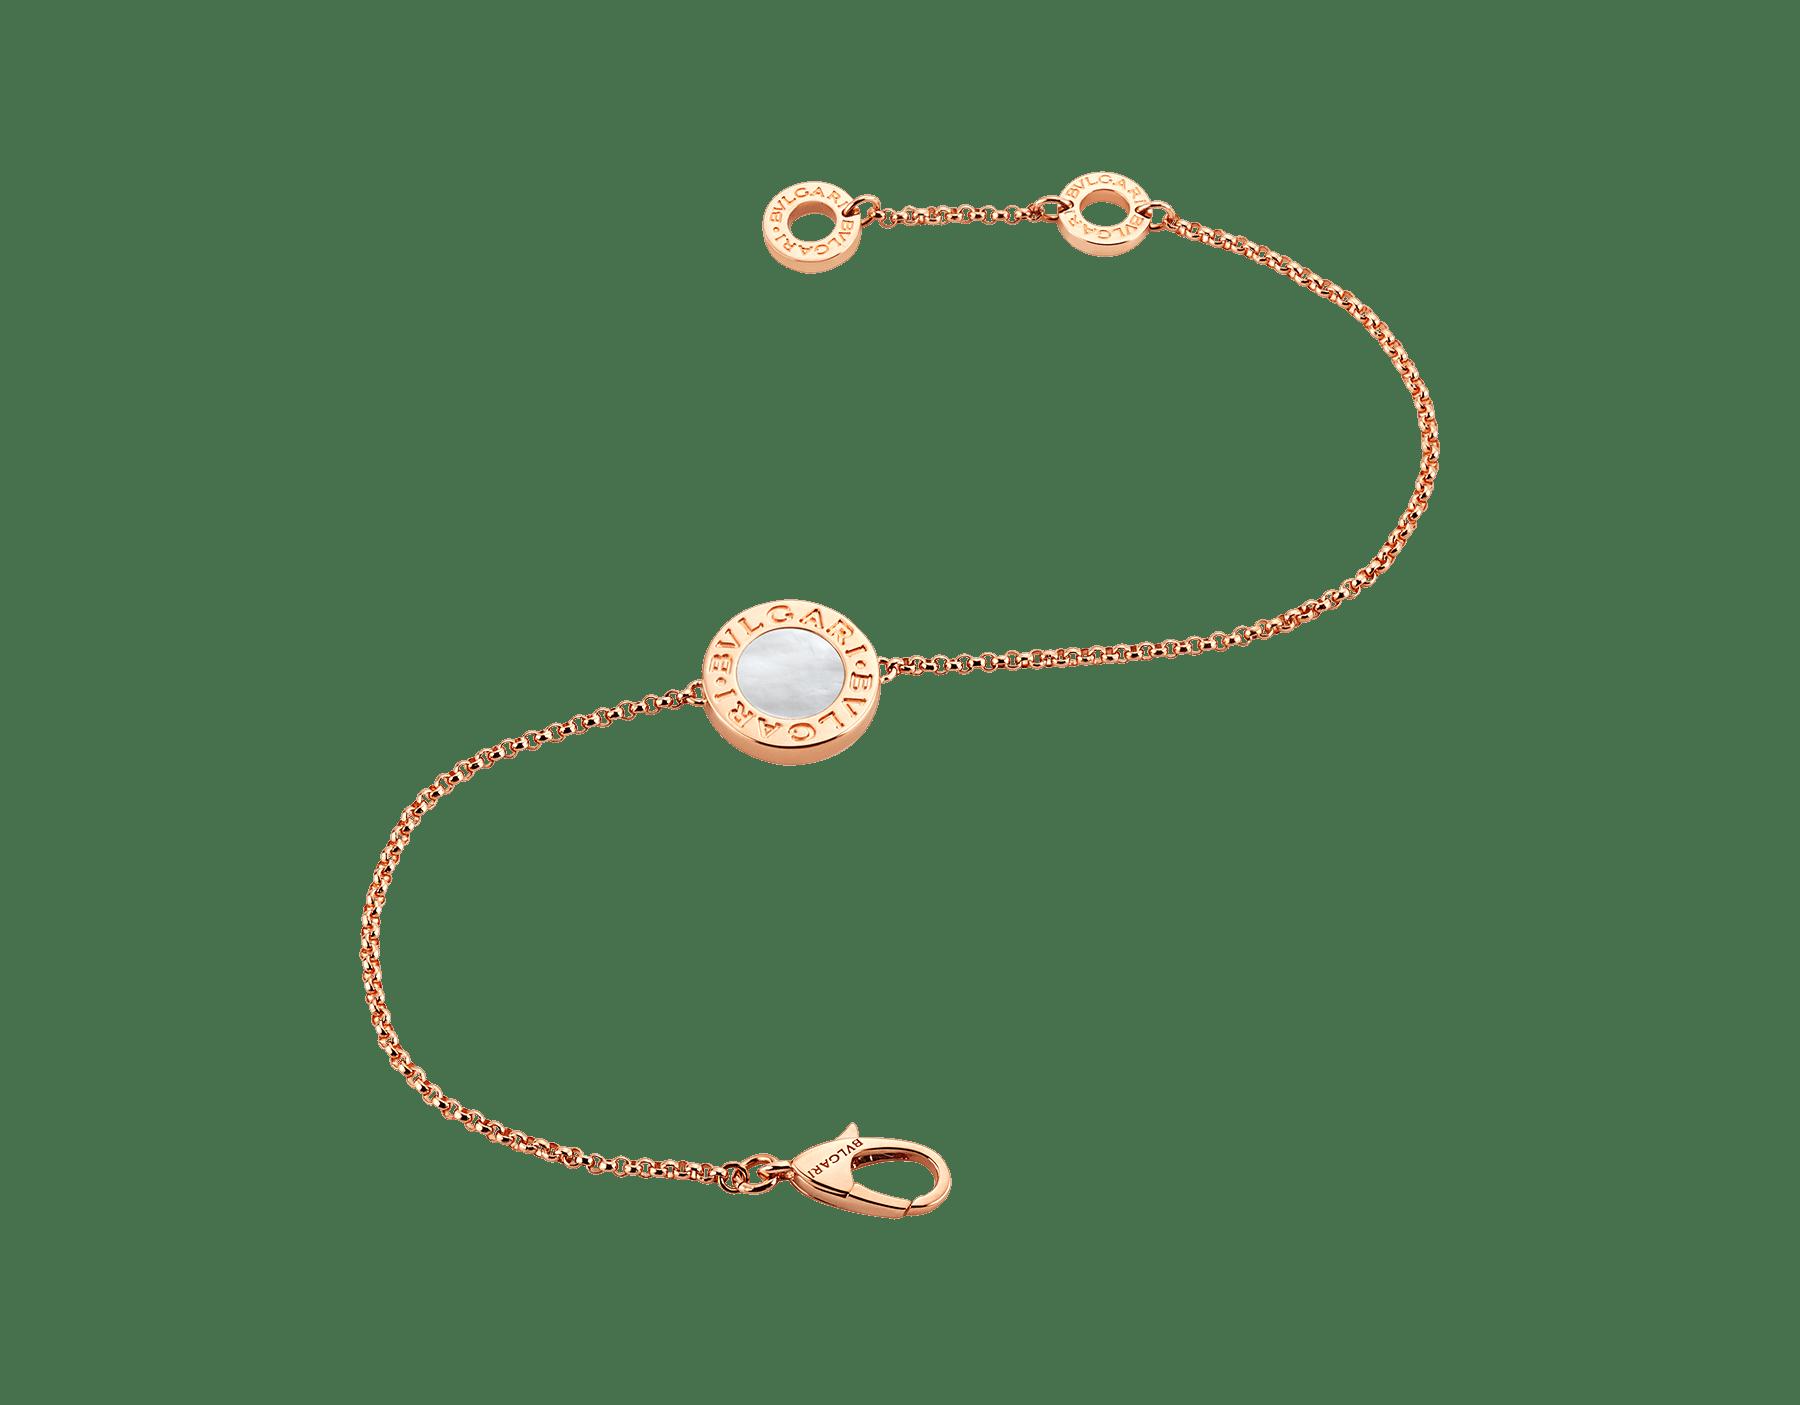 Pulsera BVLGARI BVLGARI en oro rosa de 18qt con madreperla engastada. BR857192 image 2